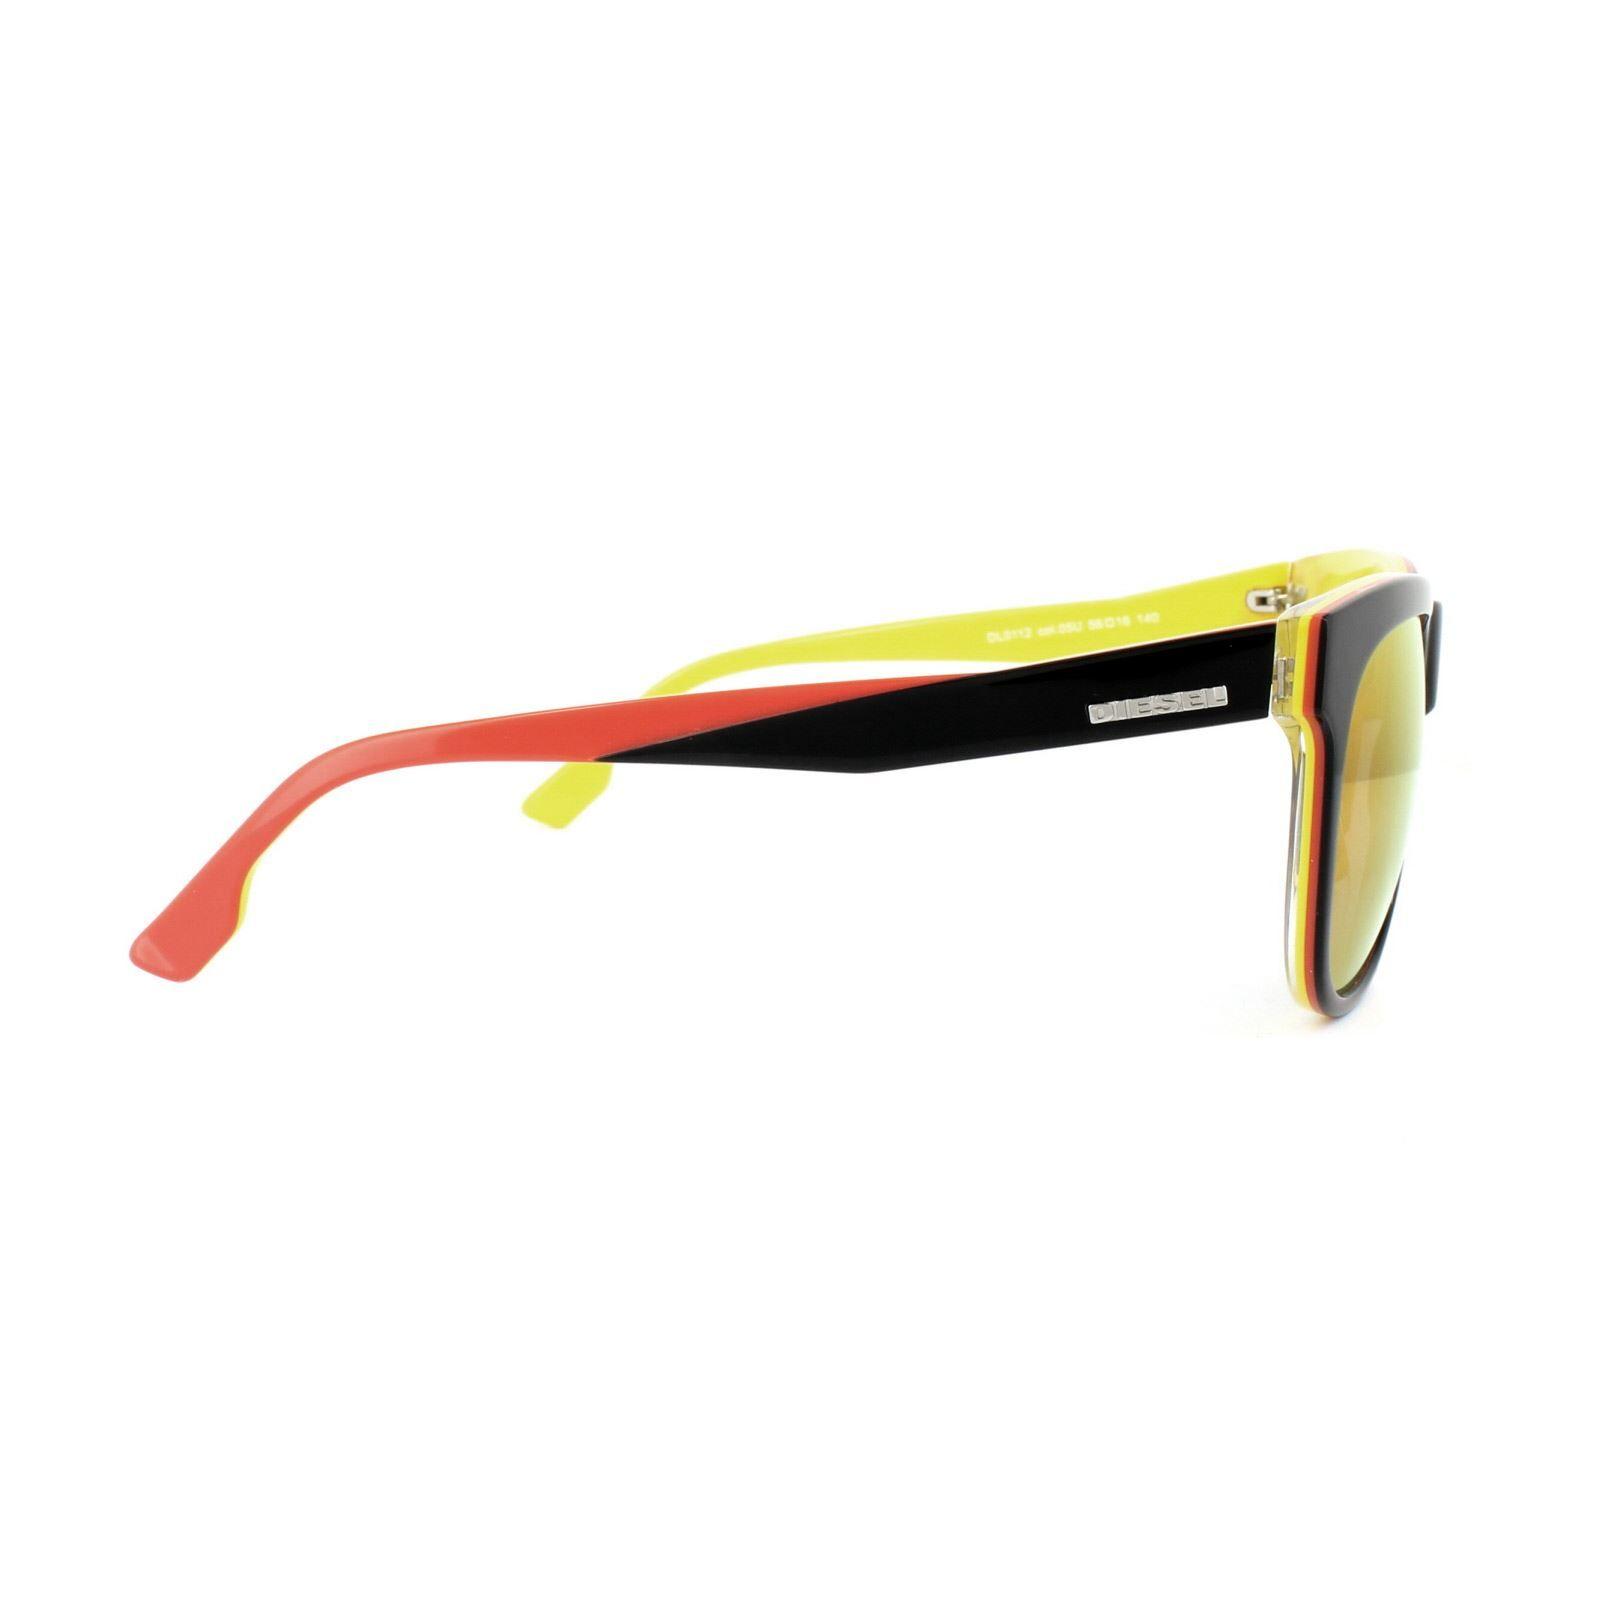 Diesel Sunglasses DL0112 05U Black Red & Yellow Red Mirror